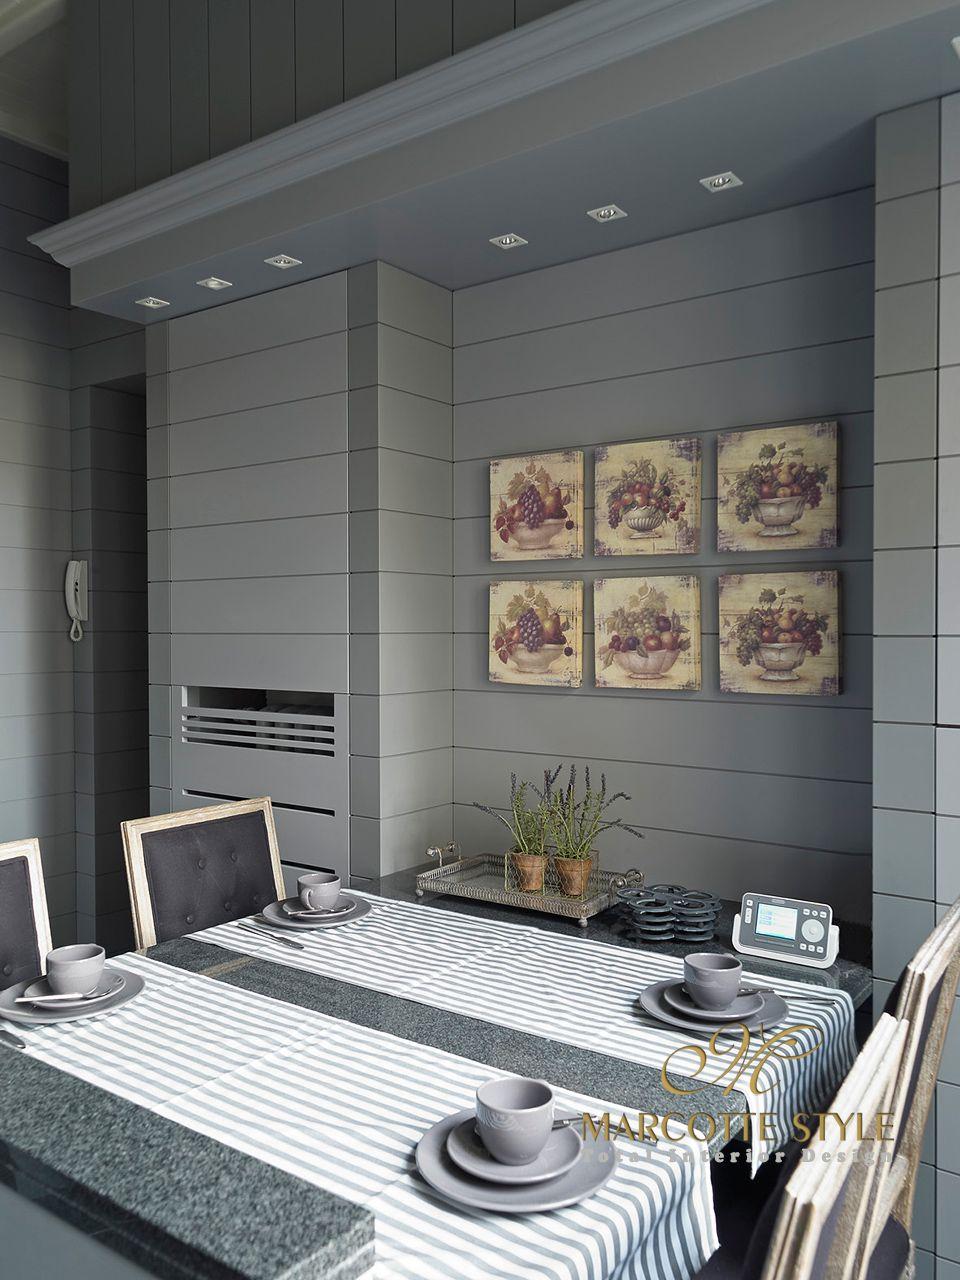 Kitchen - Marcotte Style